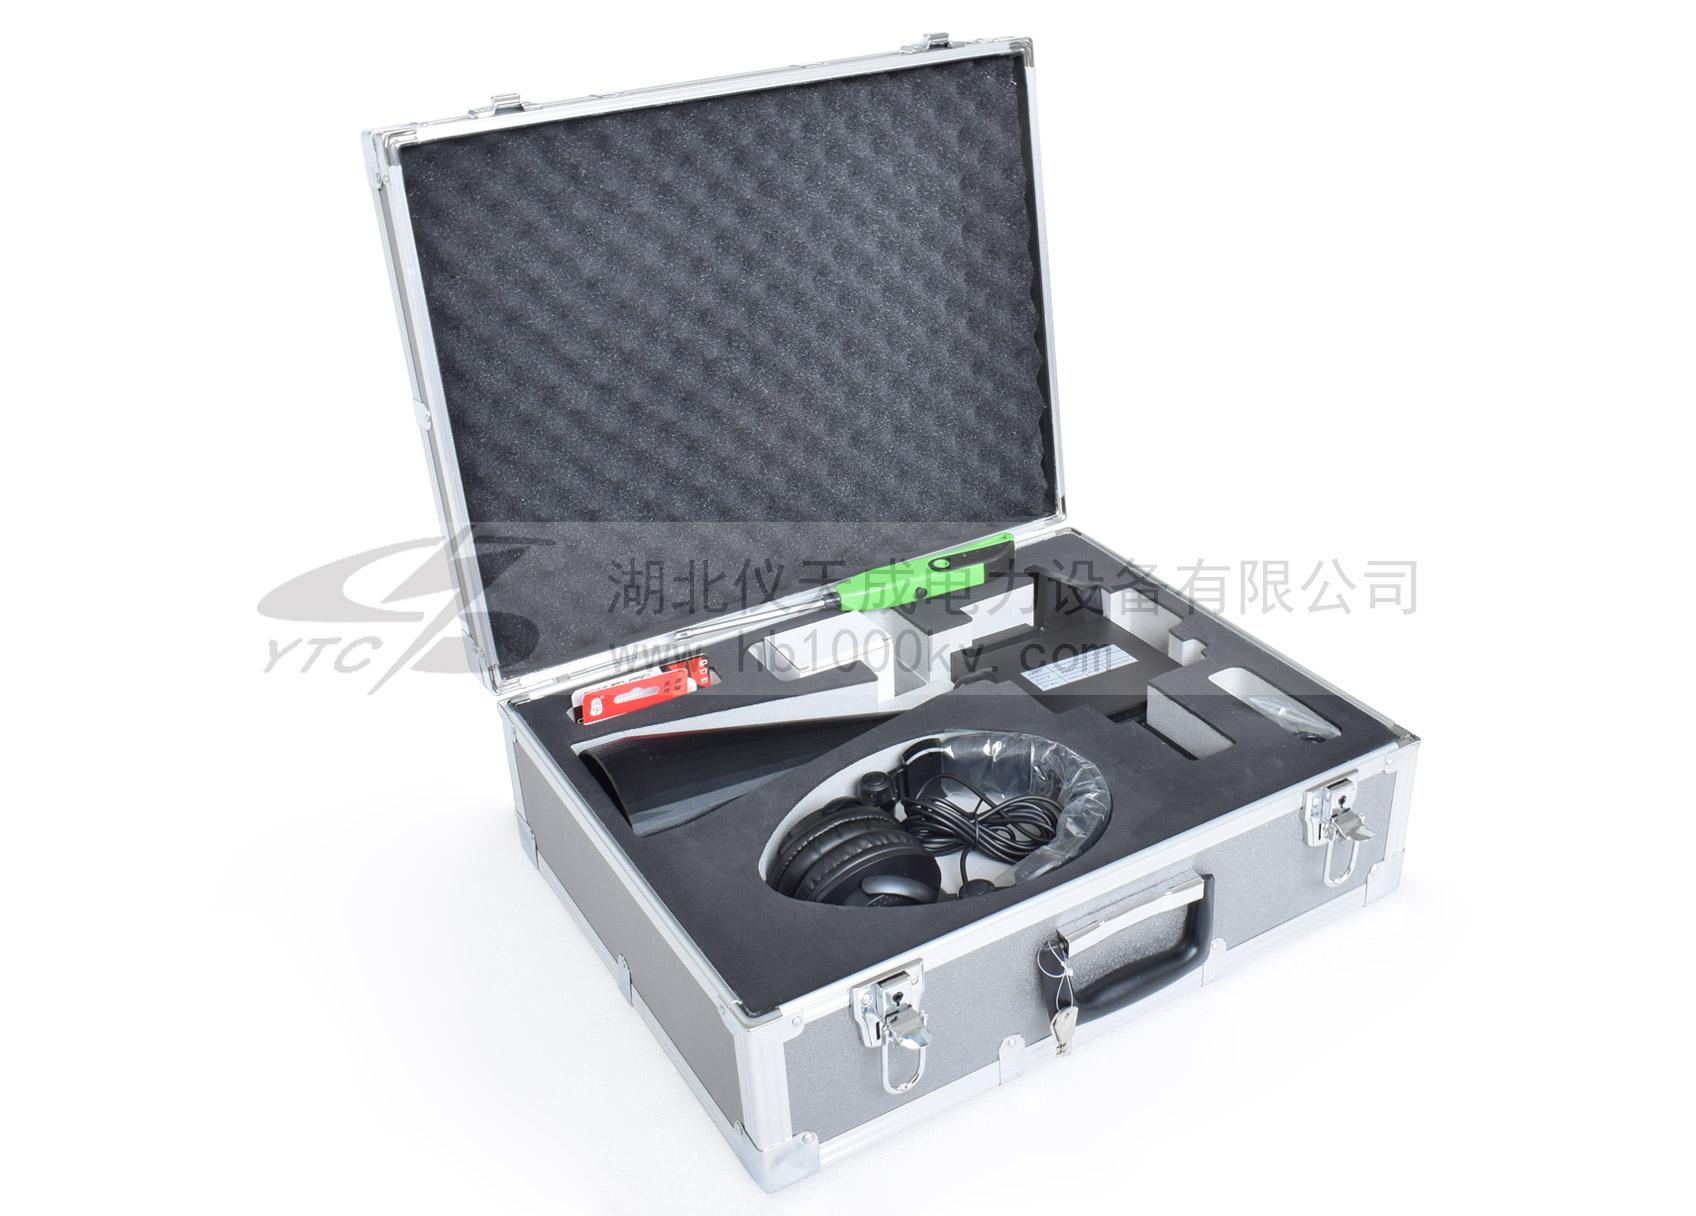 YTC3001B手持式超声波局部放电巡线仪装箱图